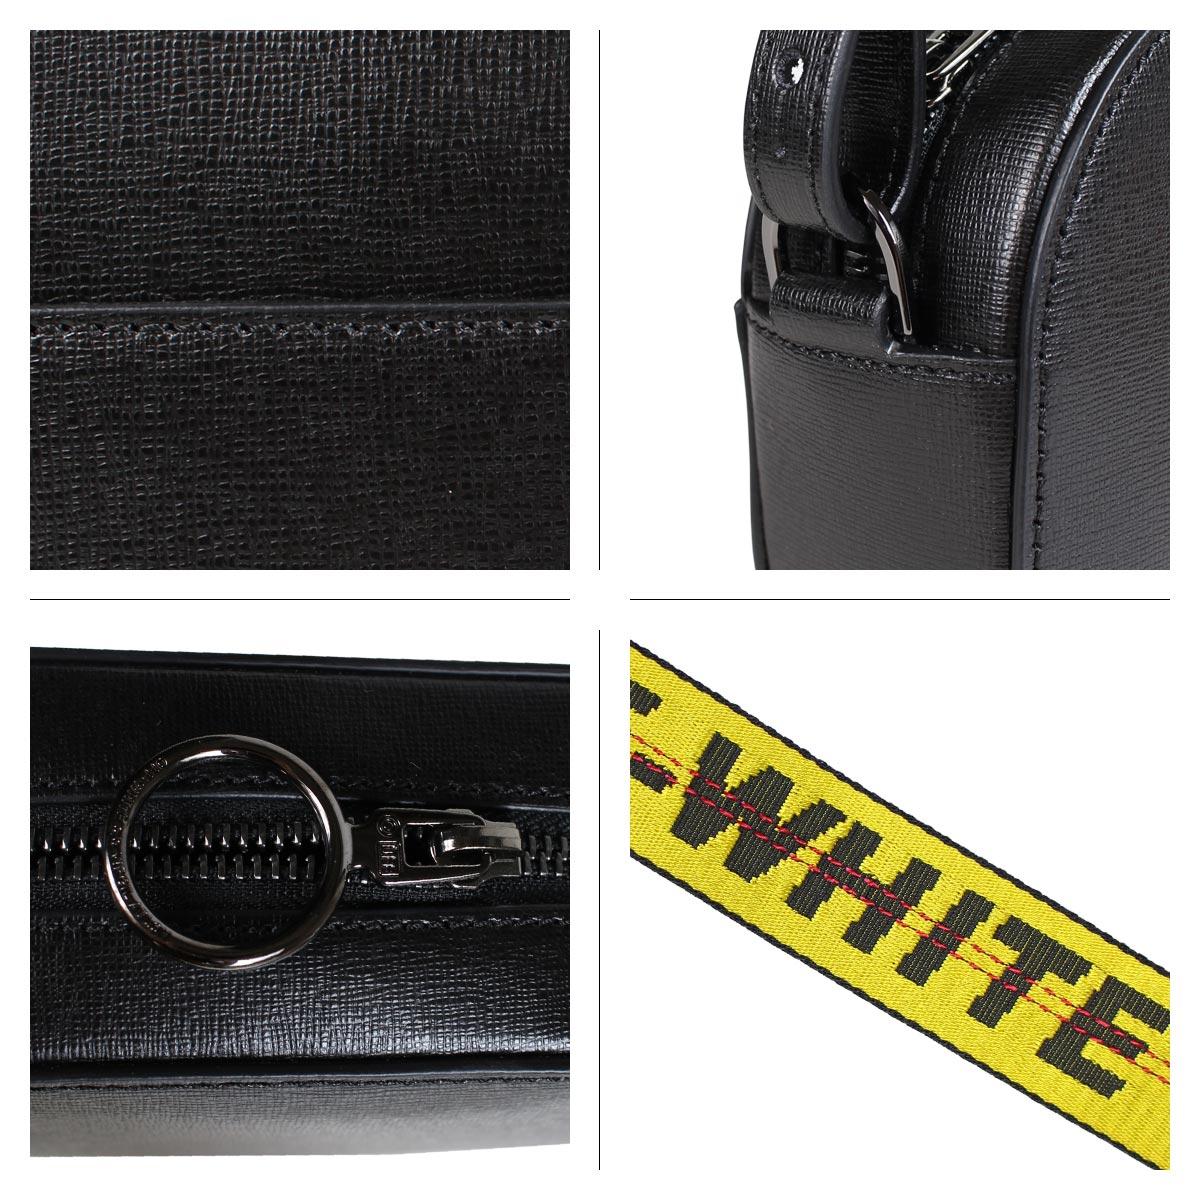 Off-white SCULPTURE CAMERA STRAP BAG オフホワイト バッグ ショルダーバッグ レディース ブラック OWNA054 423051